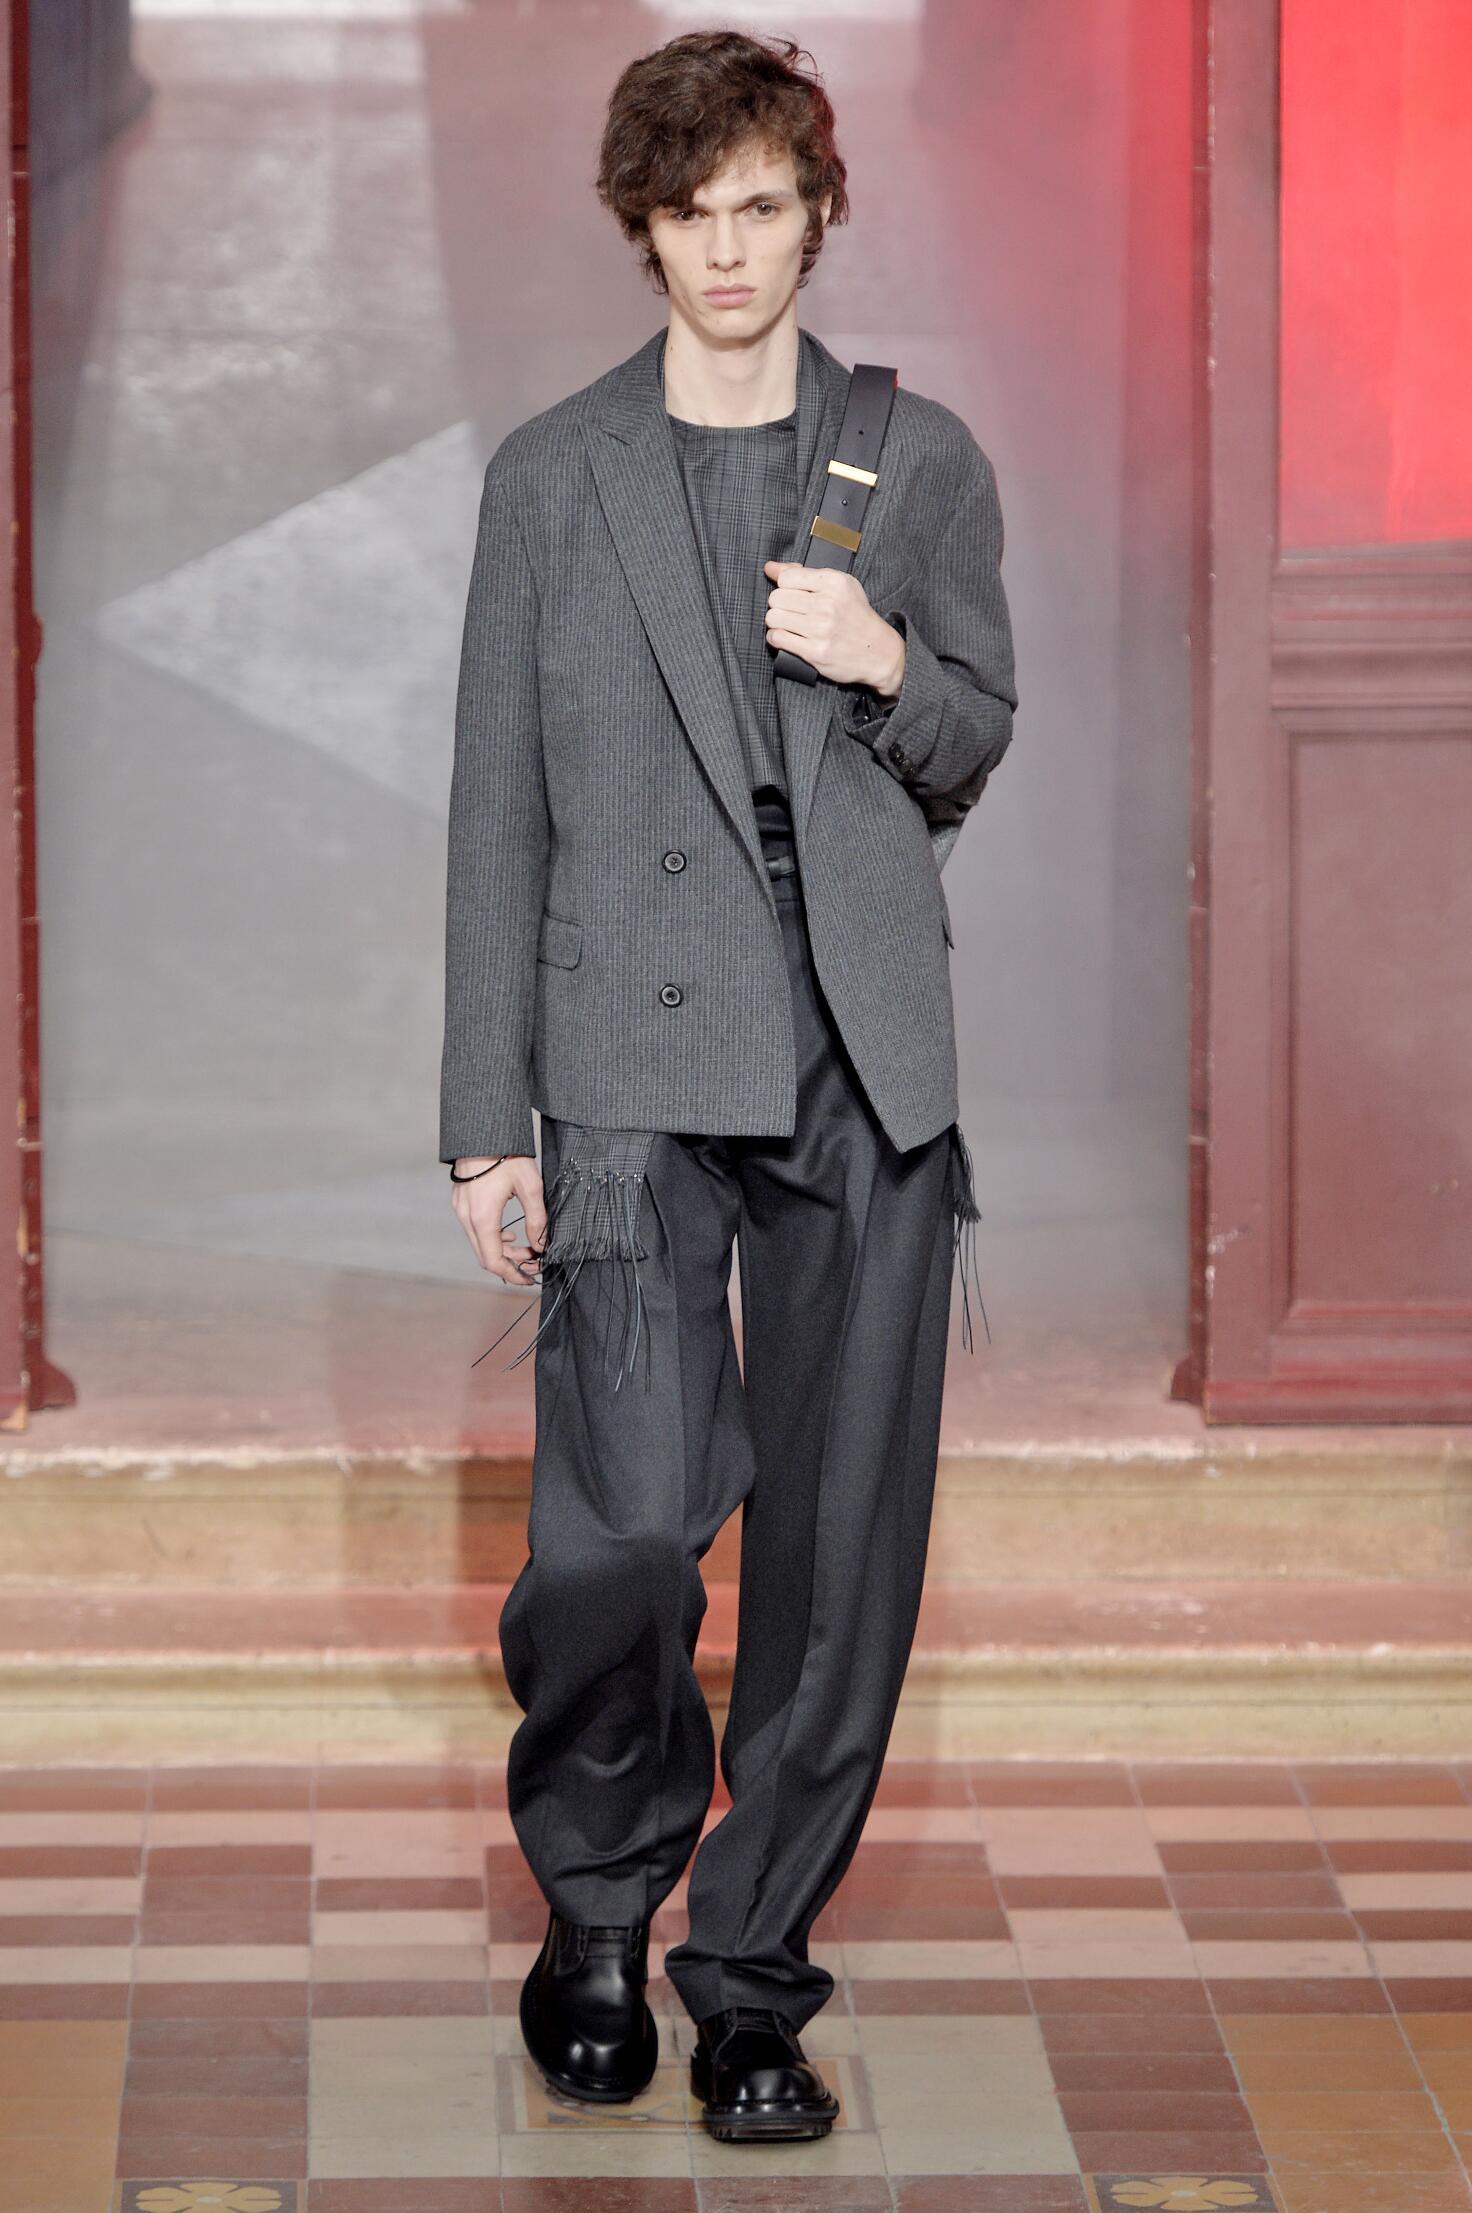 Fall 2015 Men Fashion Show Lanvin Collection ec6cc25a84a